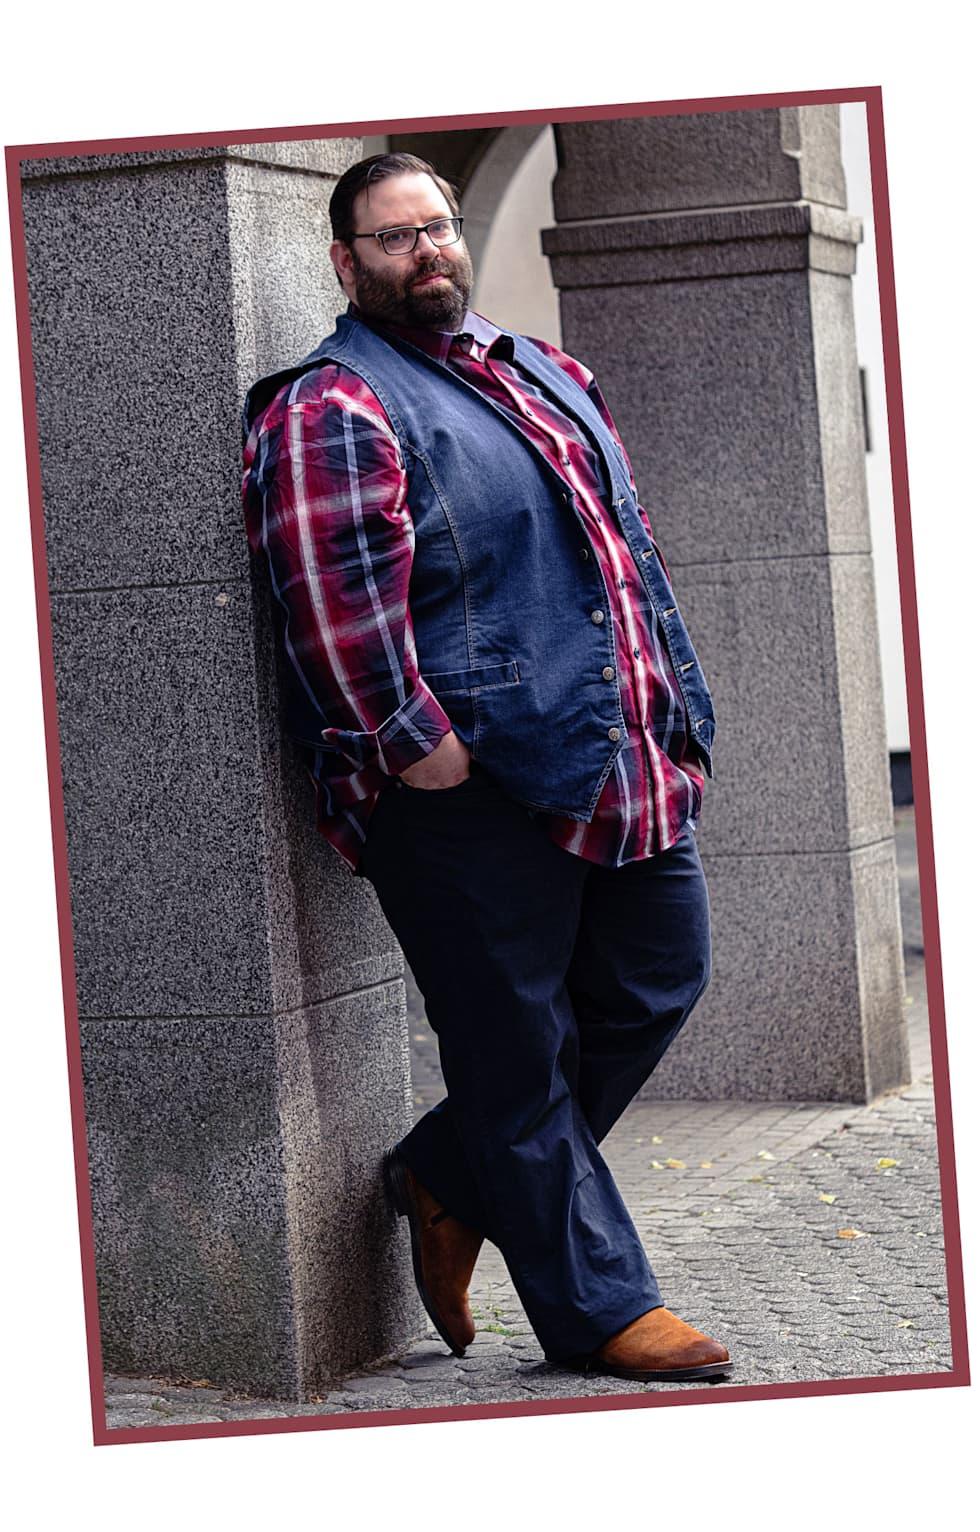 Blogger Bernd Buchkremer